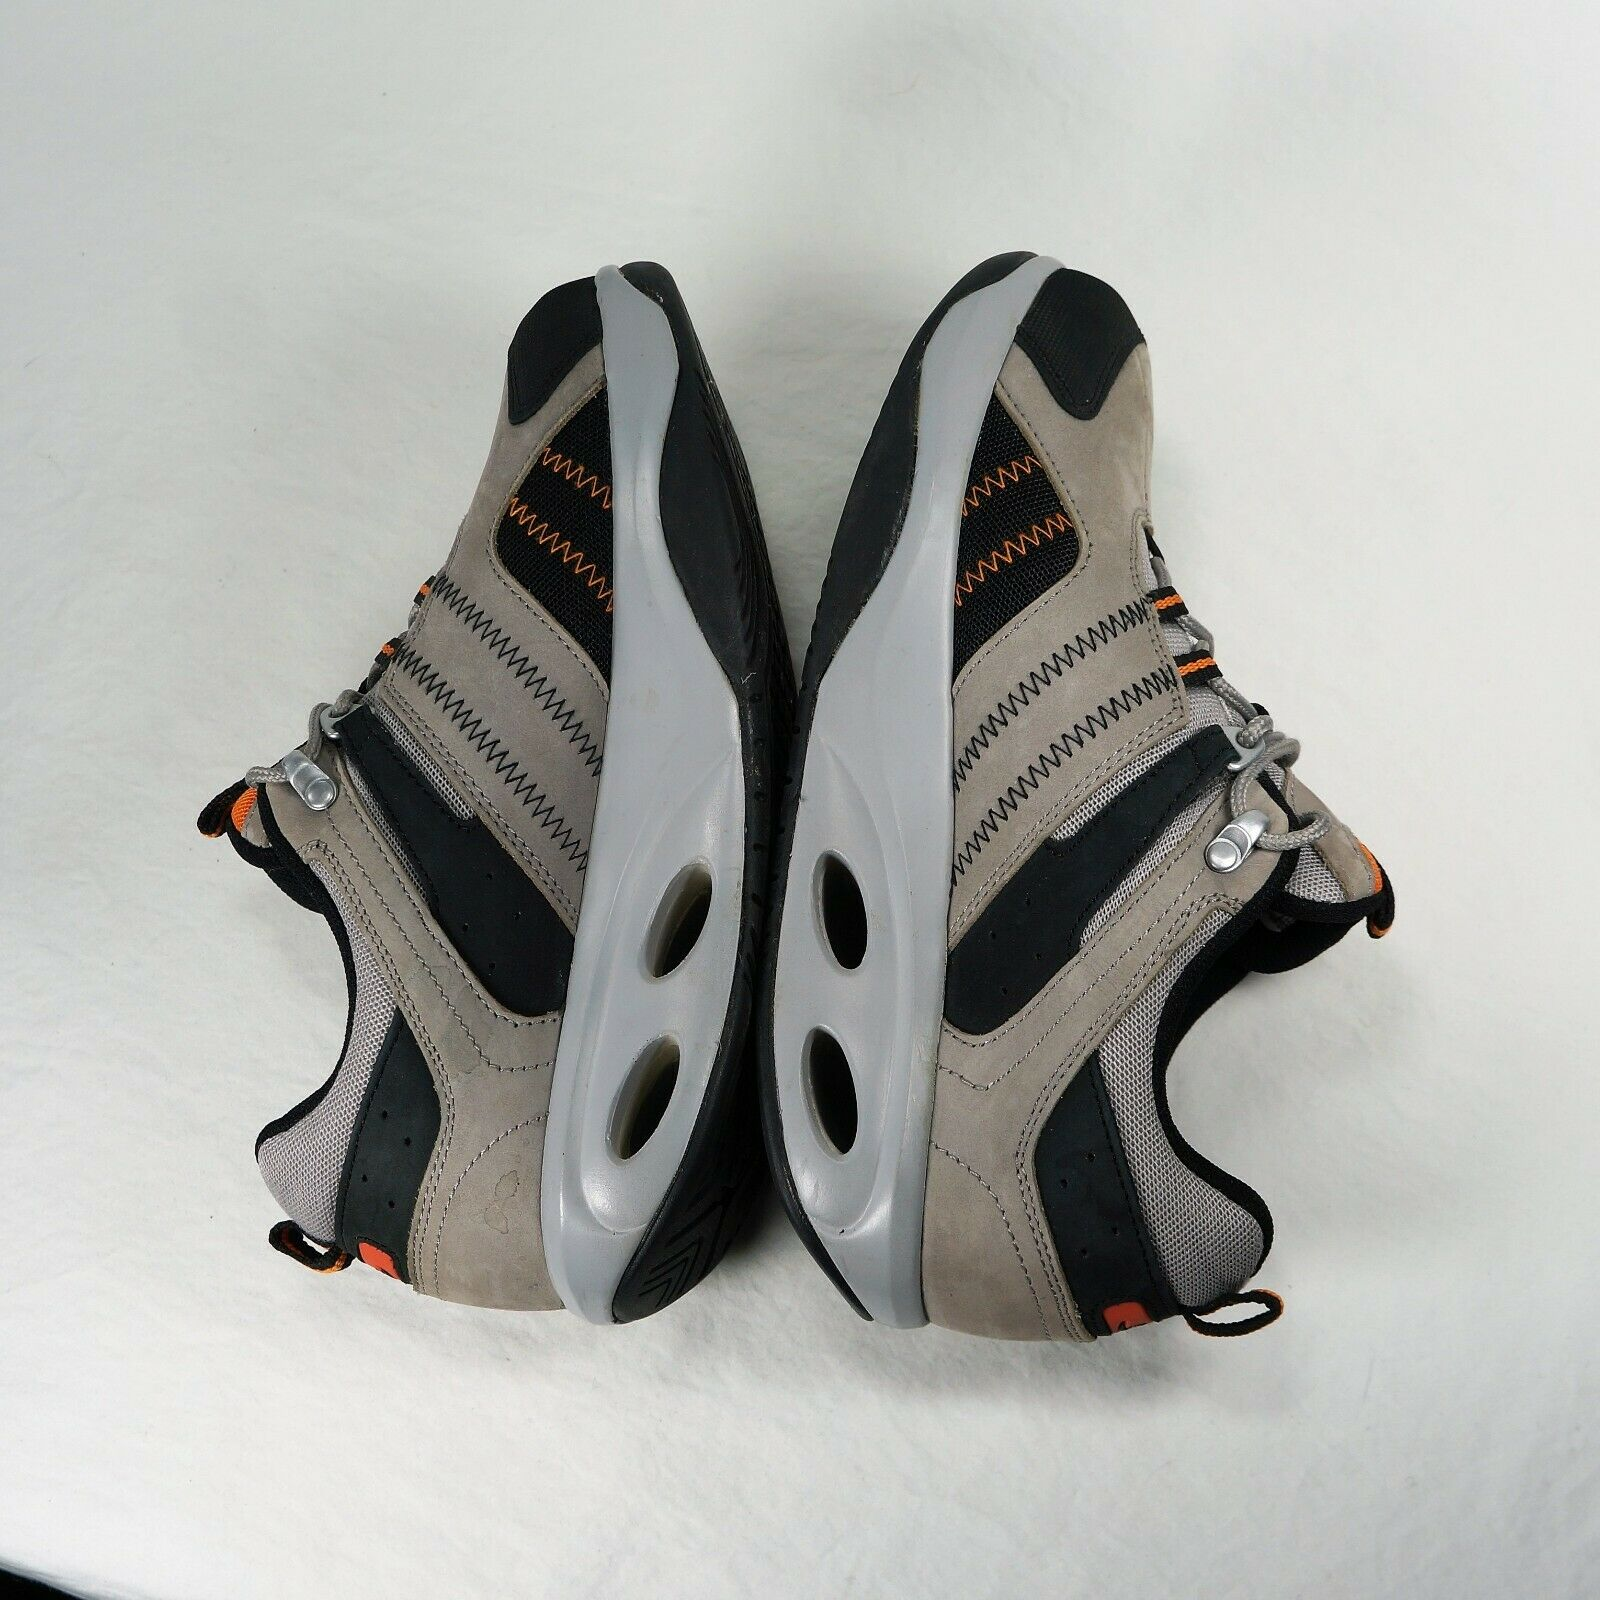 Chung Shi Stafild Uomo Walking Toning Toning Toning scarpe US 8.5 EUR 40 donna 6.5 EUC 652491